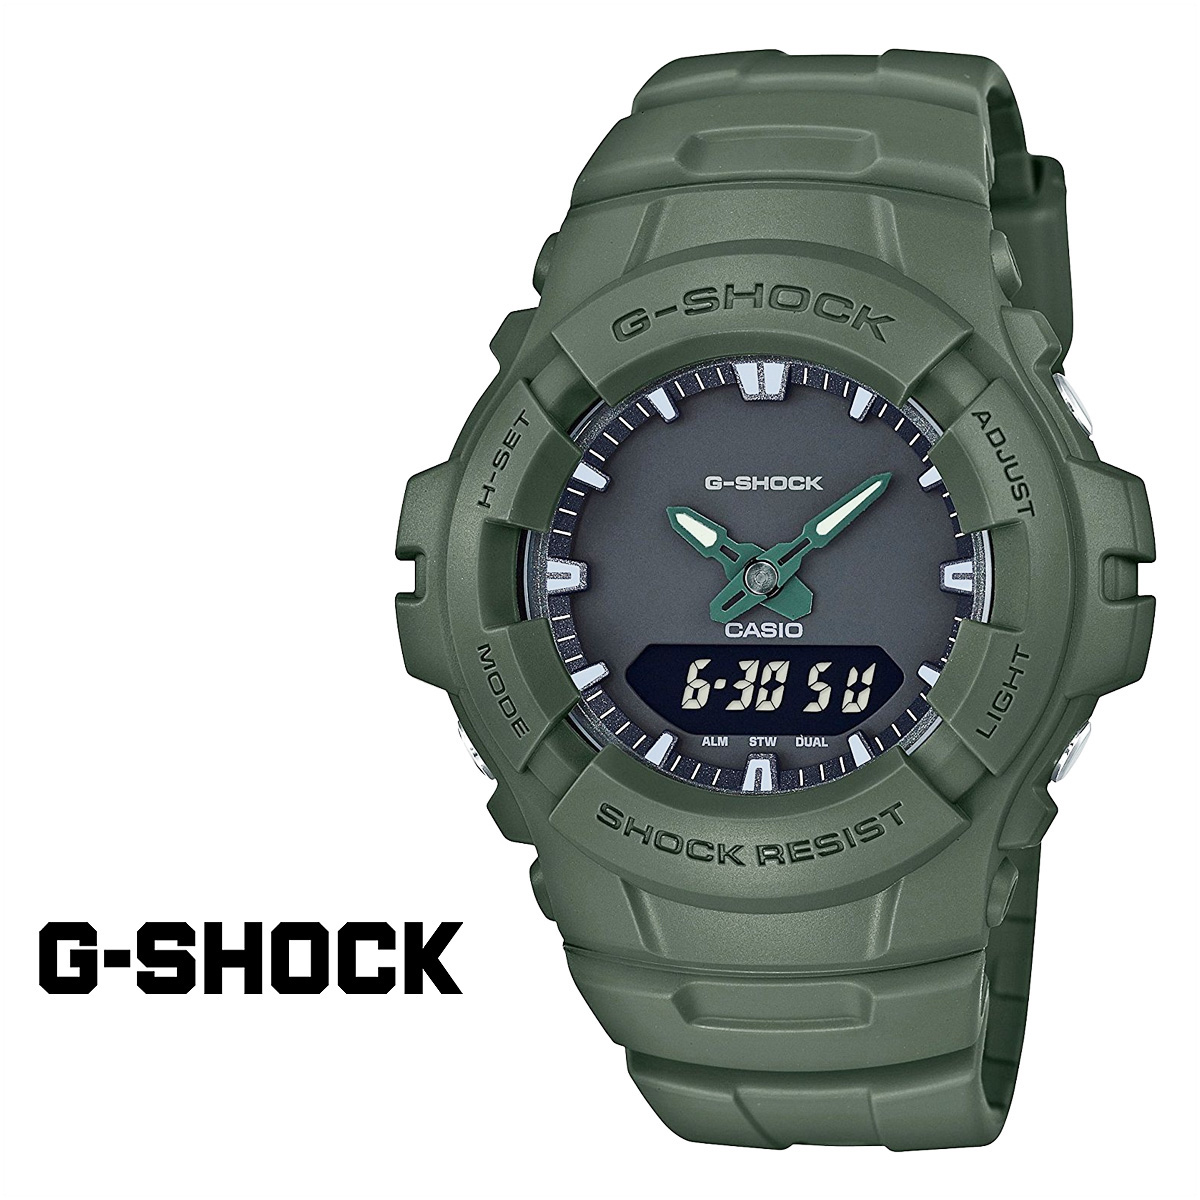 Casio Casio G Shock Watch Green G 100cu 3ajf ジーショック G Shock G Shock Men Gap Dis Clock Khaki